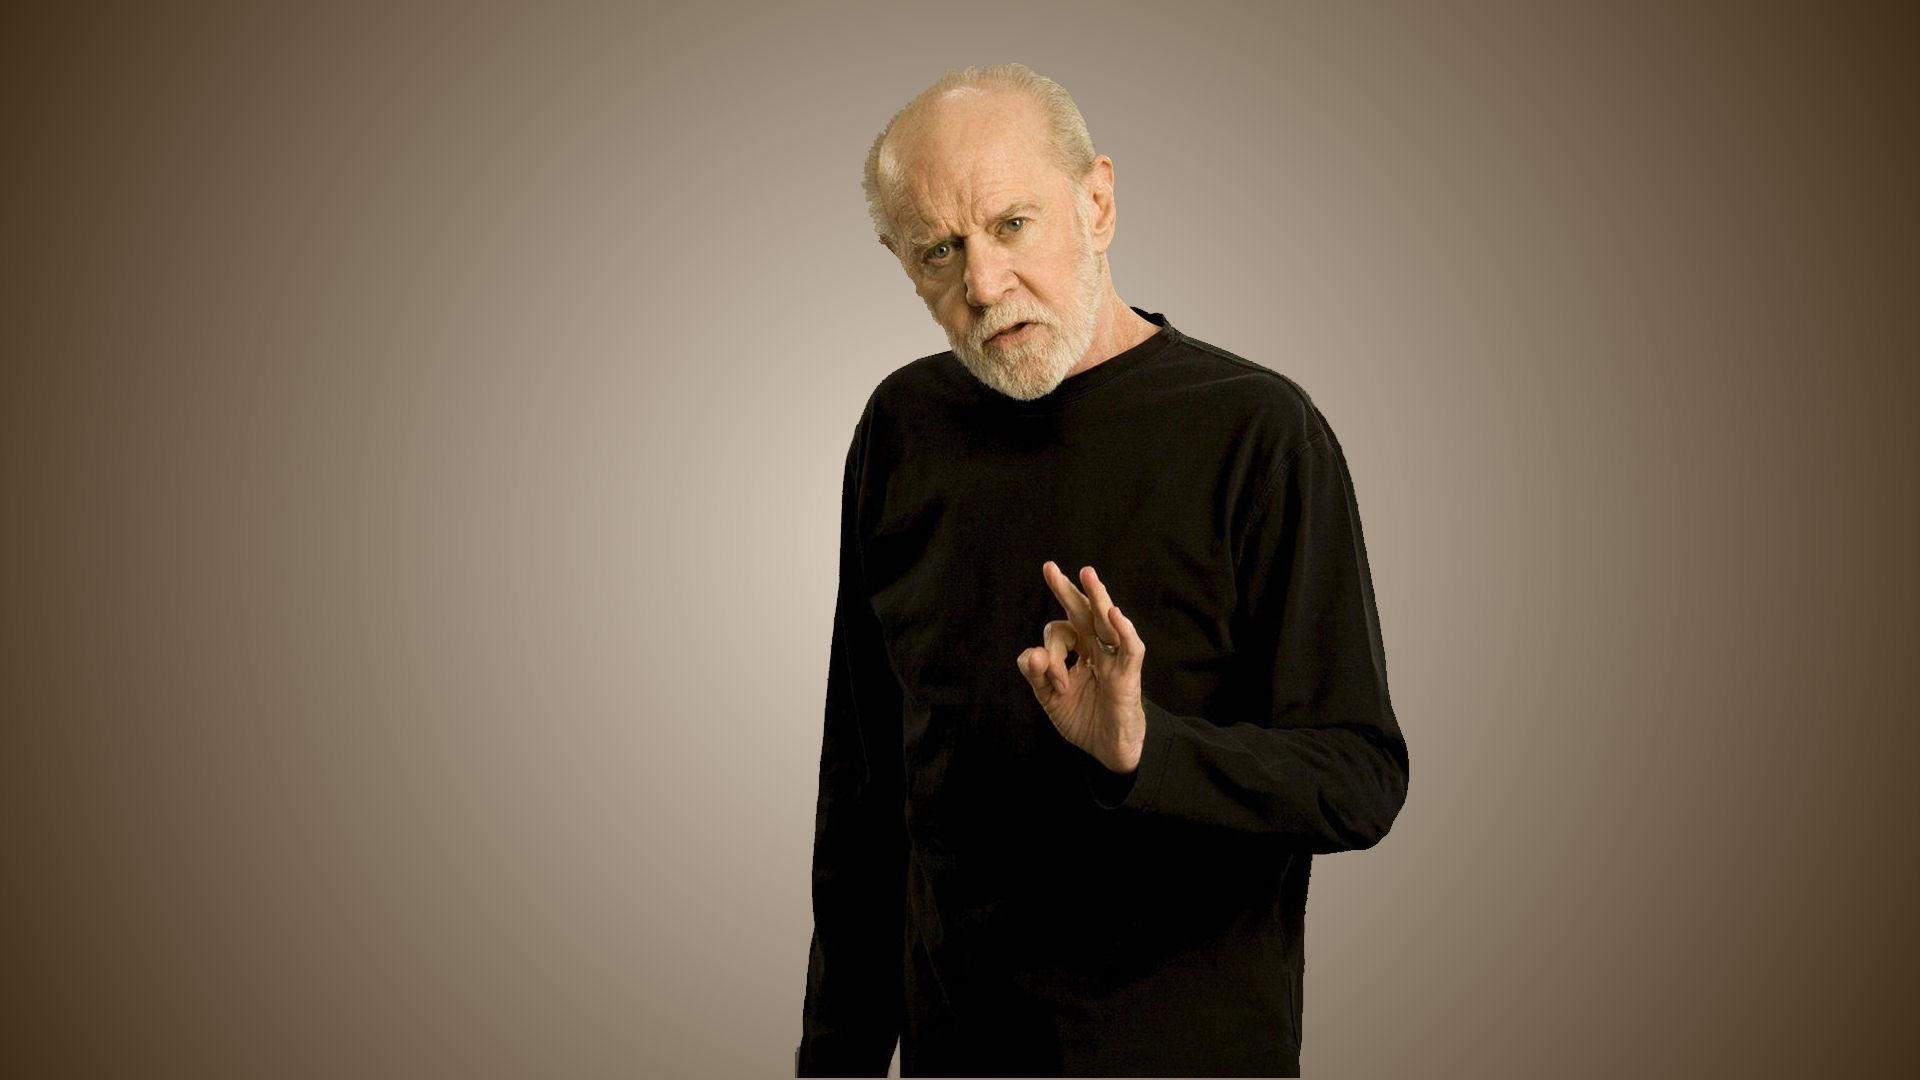 Show George Carlin